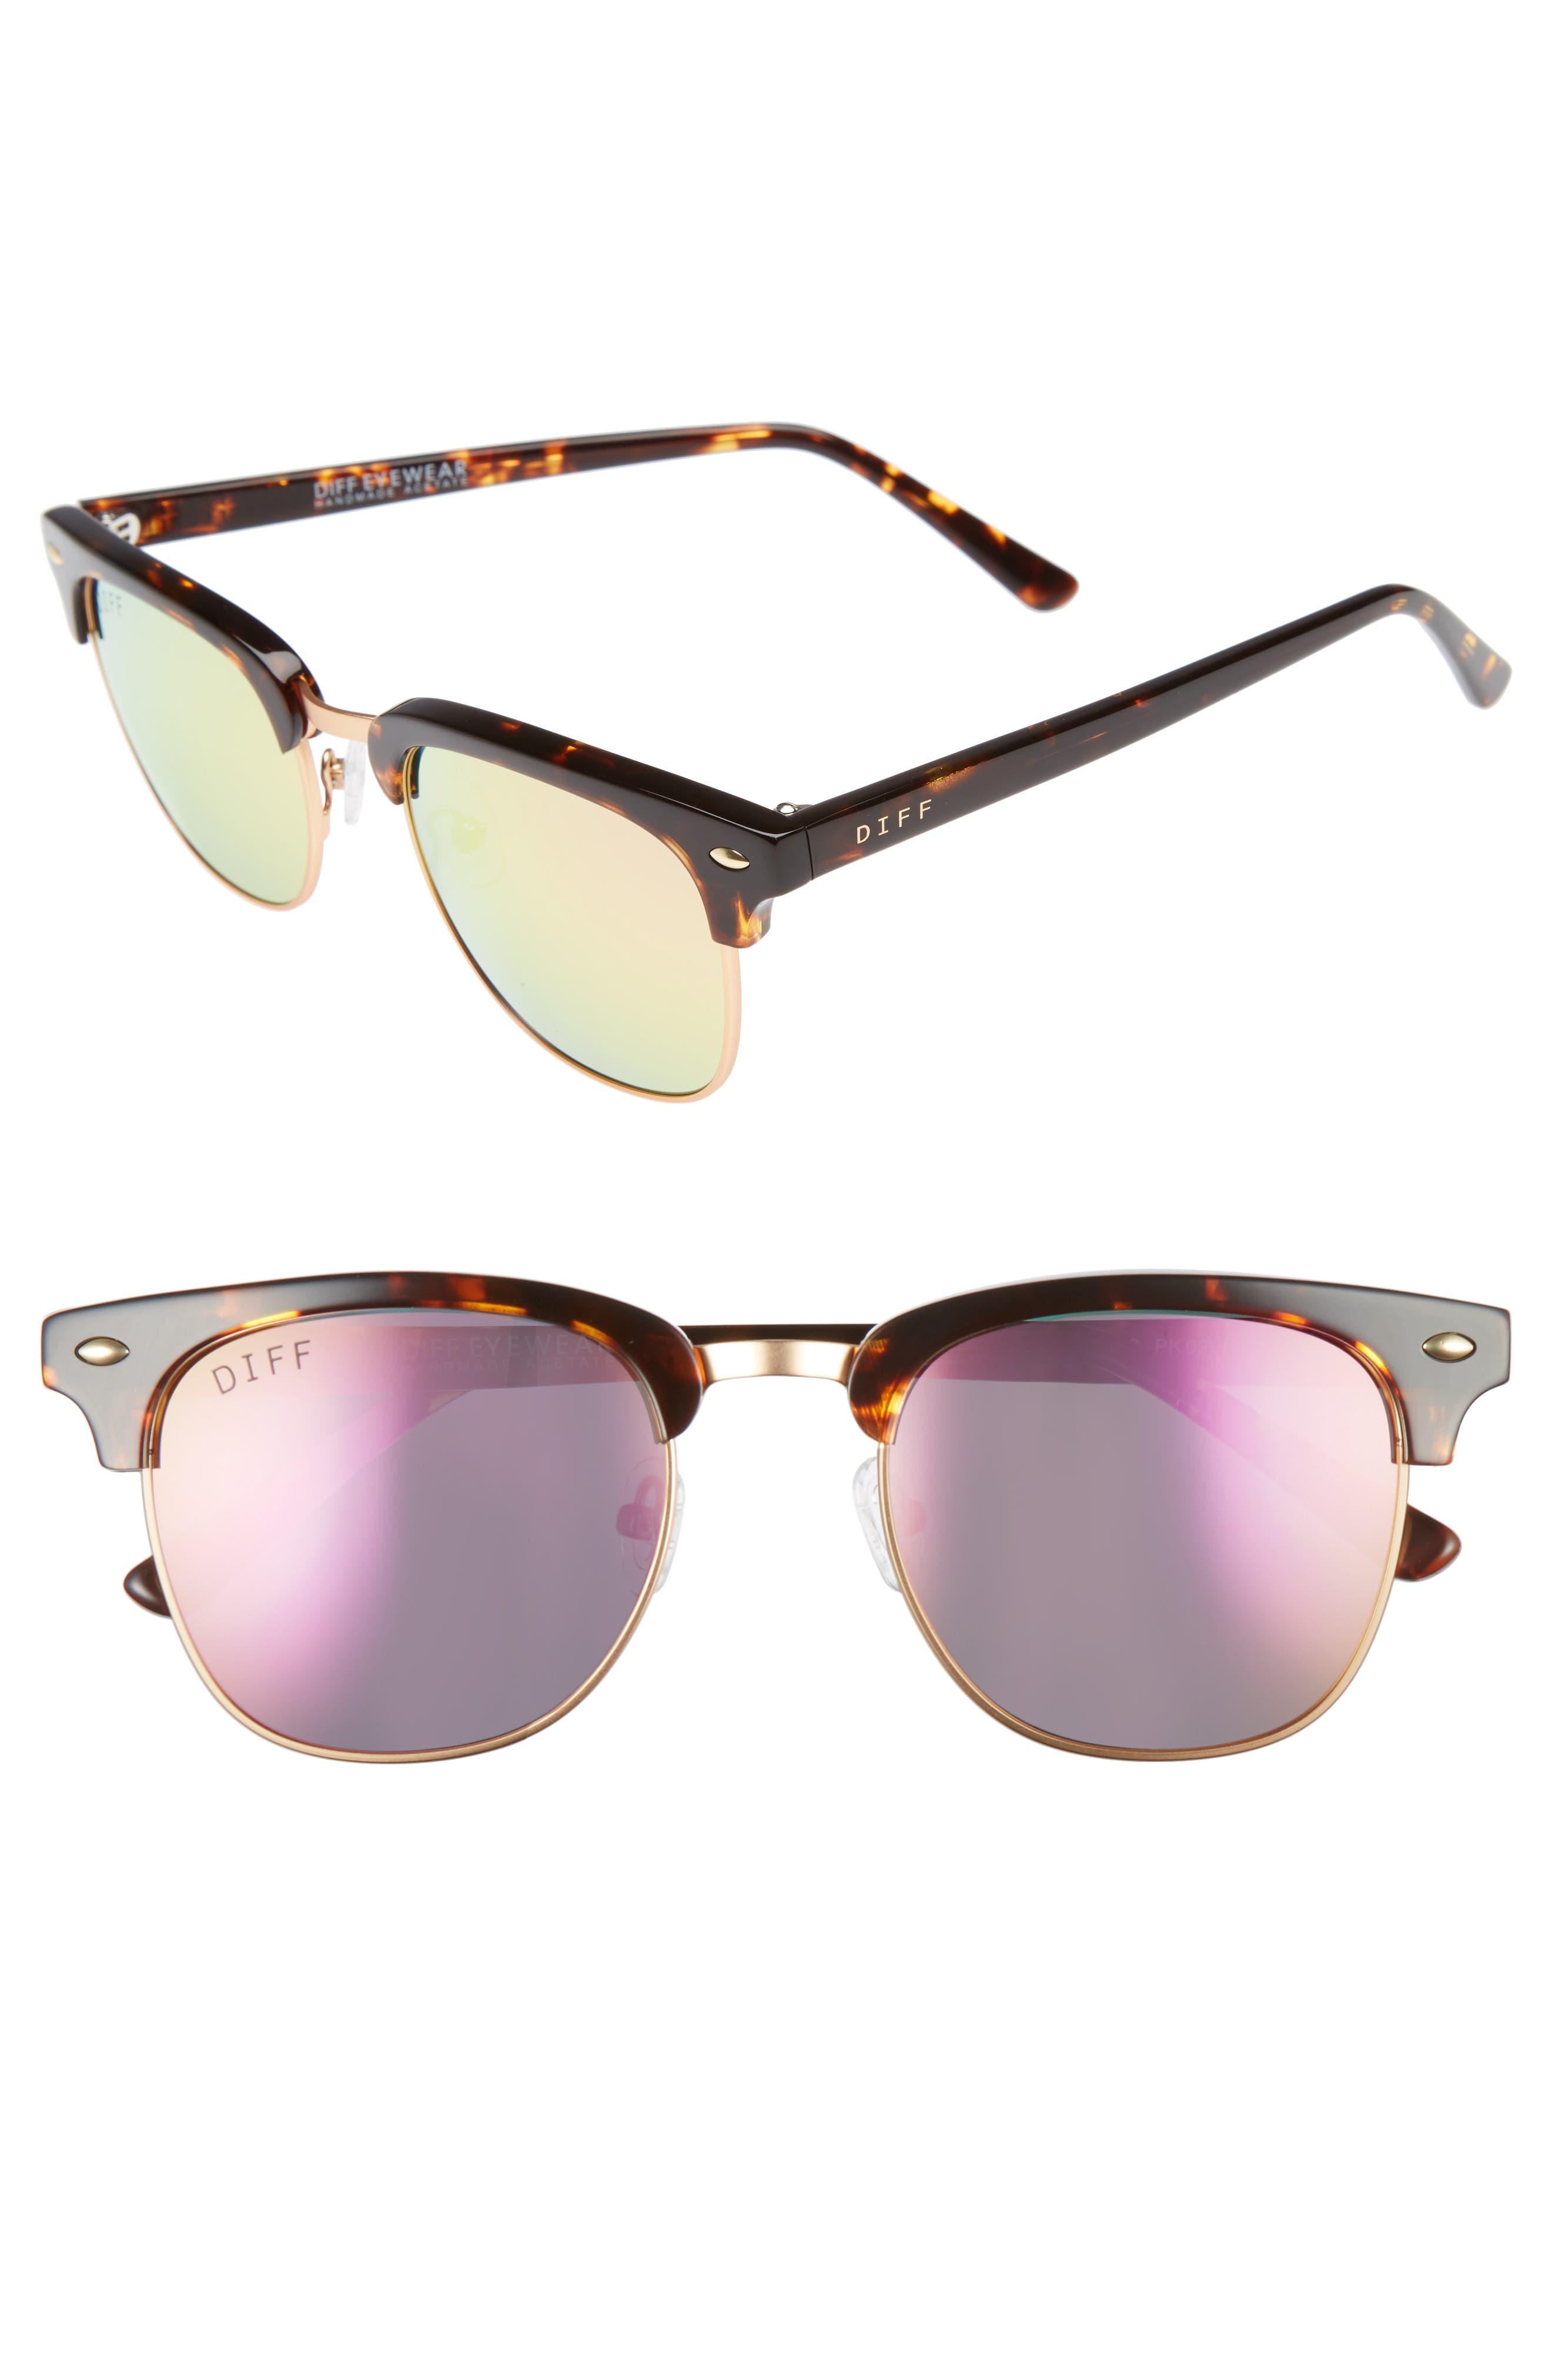 Barry 51mm Polarized Retro Sunglasses,                             Main thumbnail 6, color,